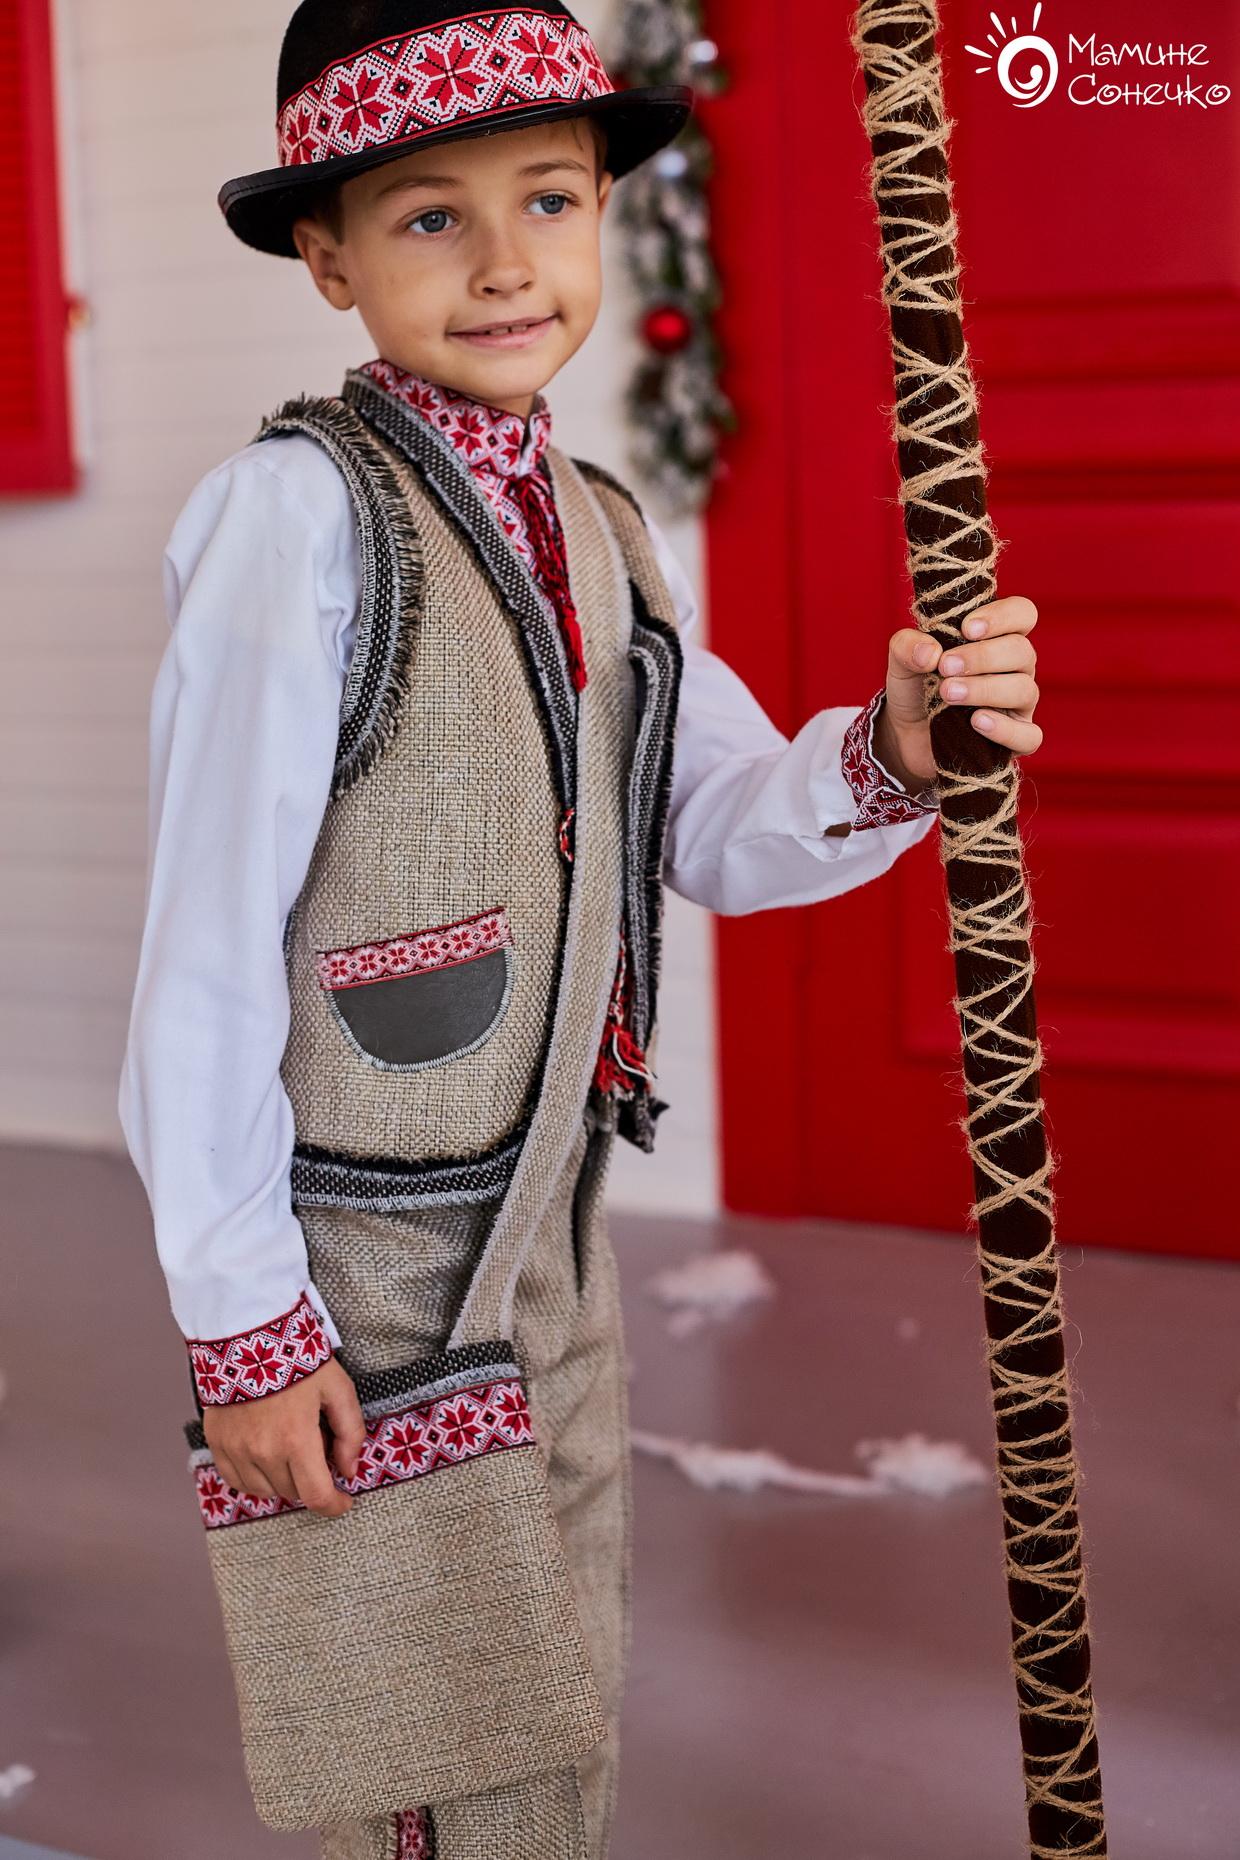 kostium-pastukh-bahatyi-6